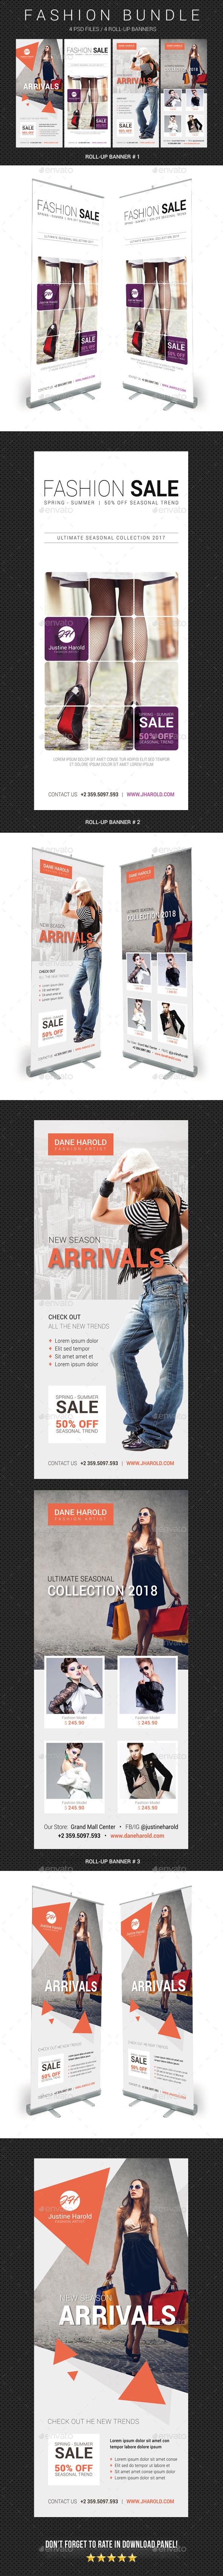 Fashion Banner Templates - Signage Print Templates